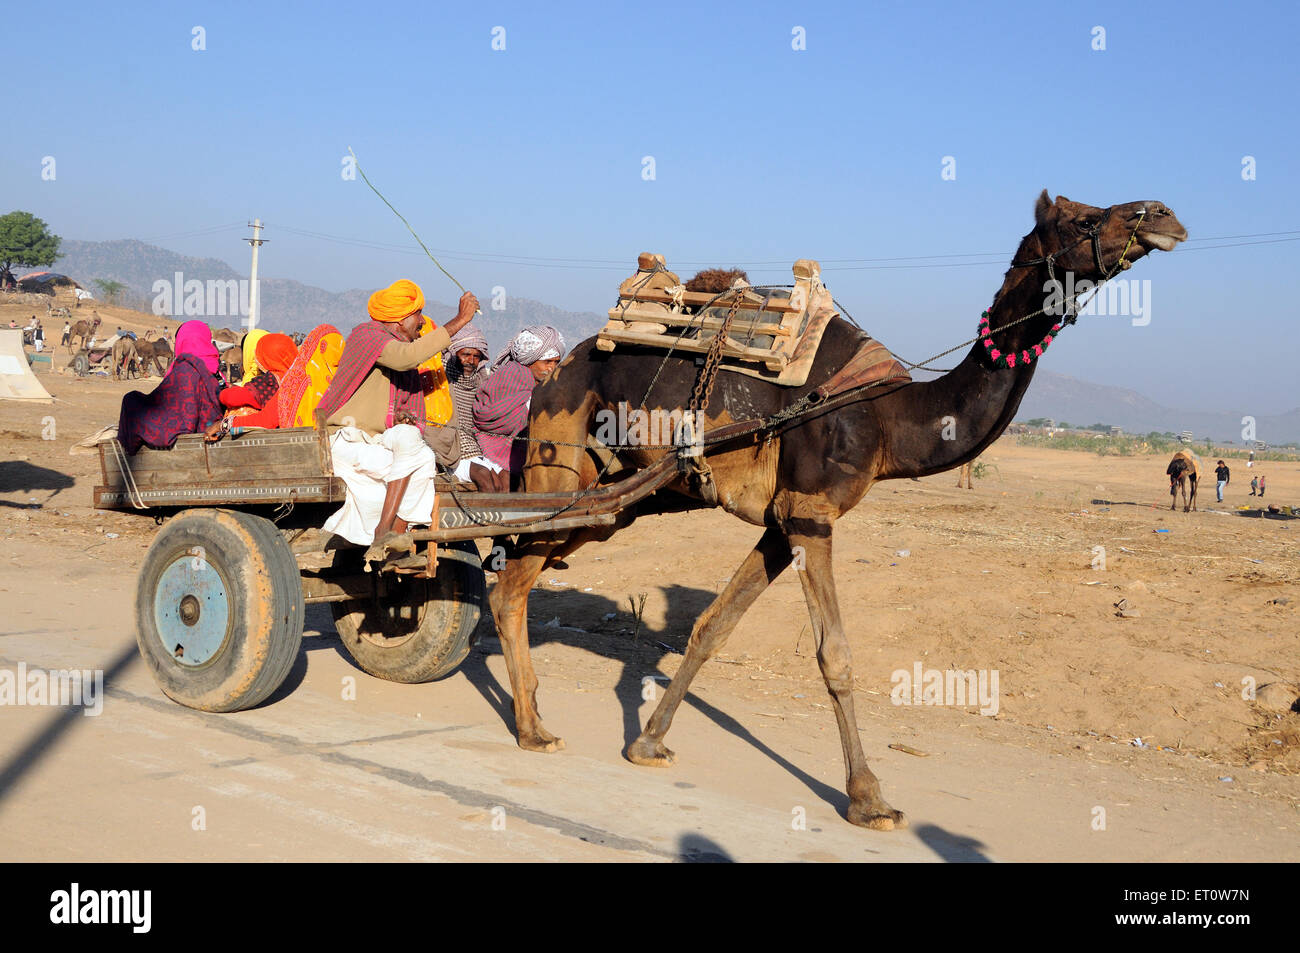 Family travelling on camel cart at pushkar fair ; Rajasthan ; India MR#786 - Stock Image